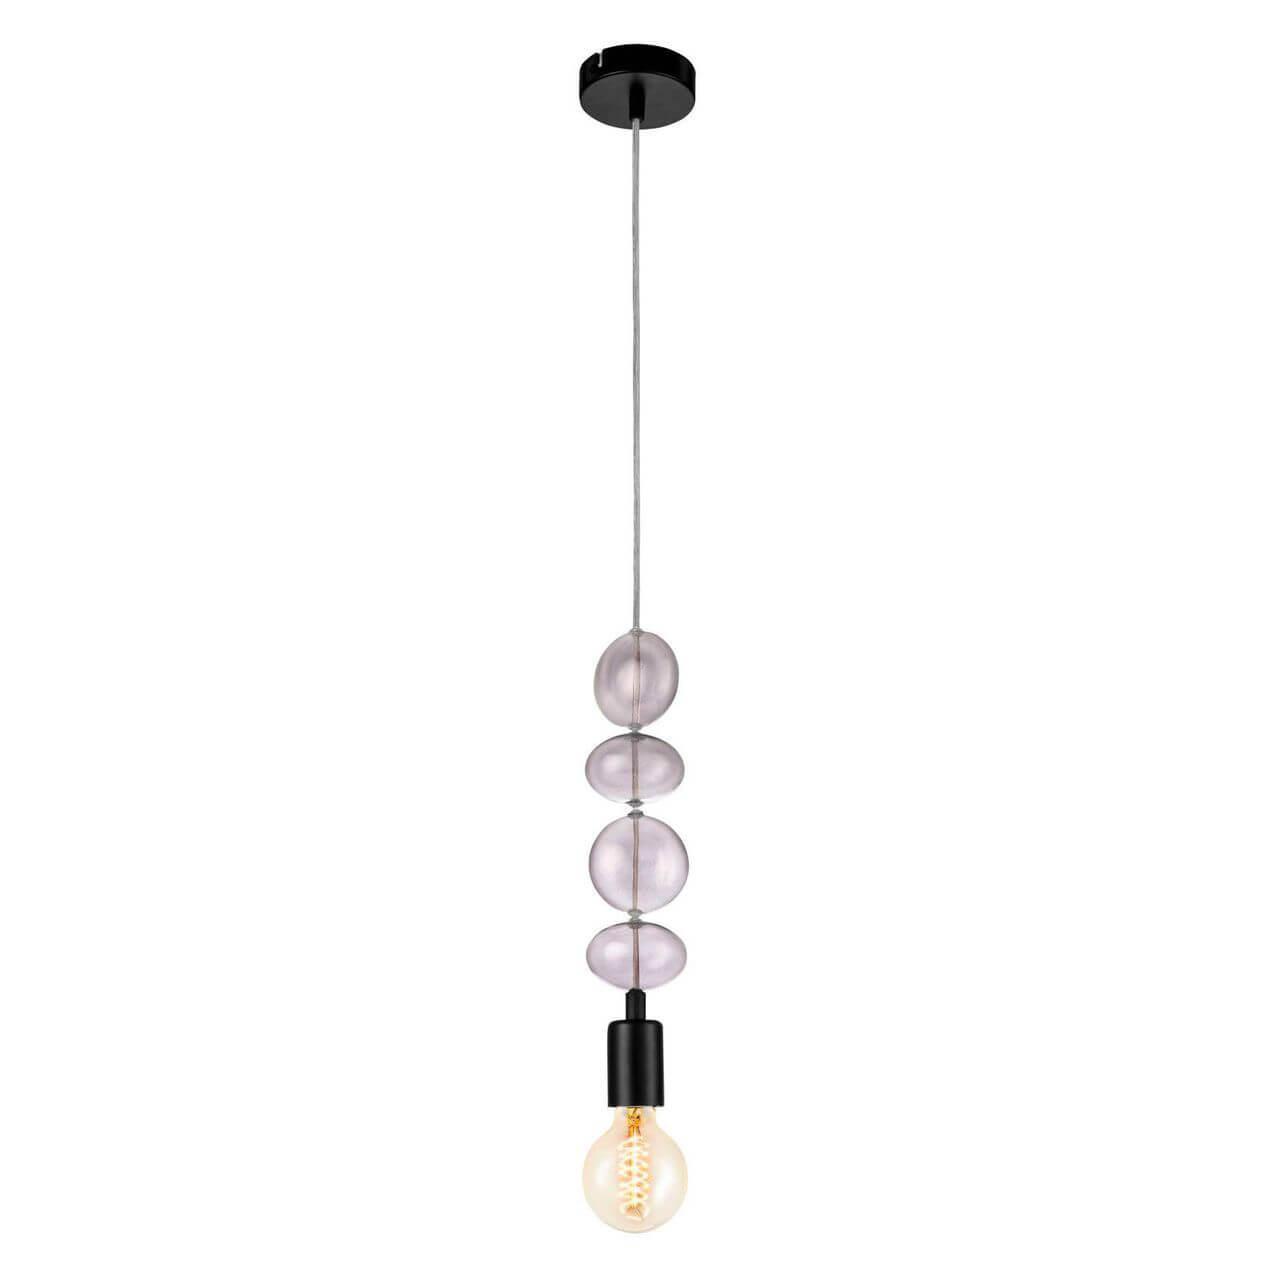 Подвесной светильник Eglo 49778, E27, 60 Вт цена